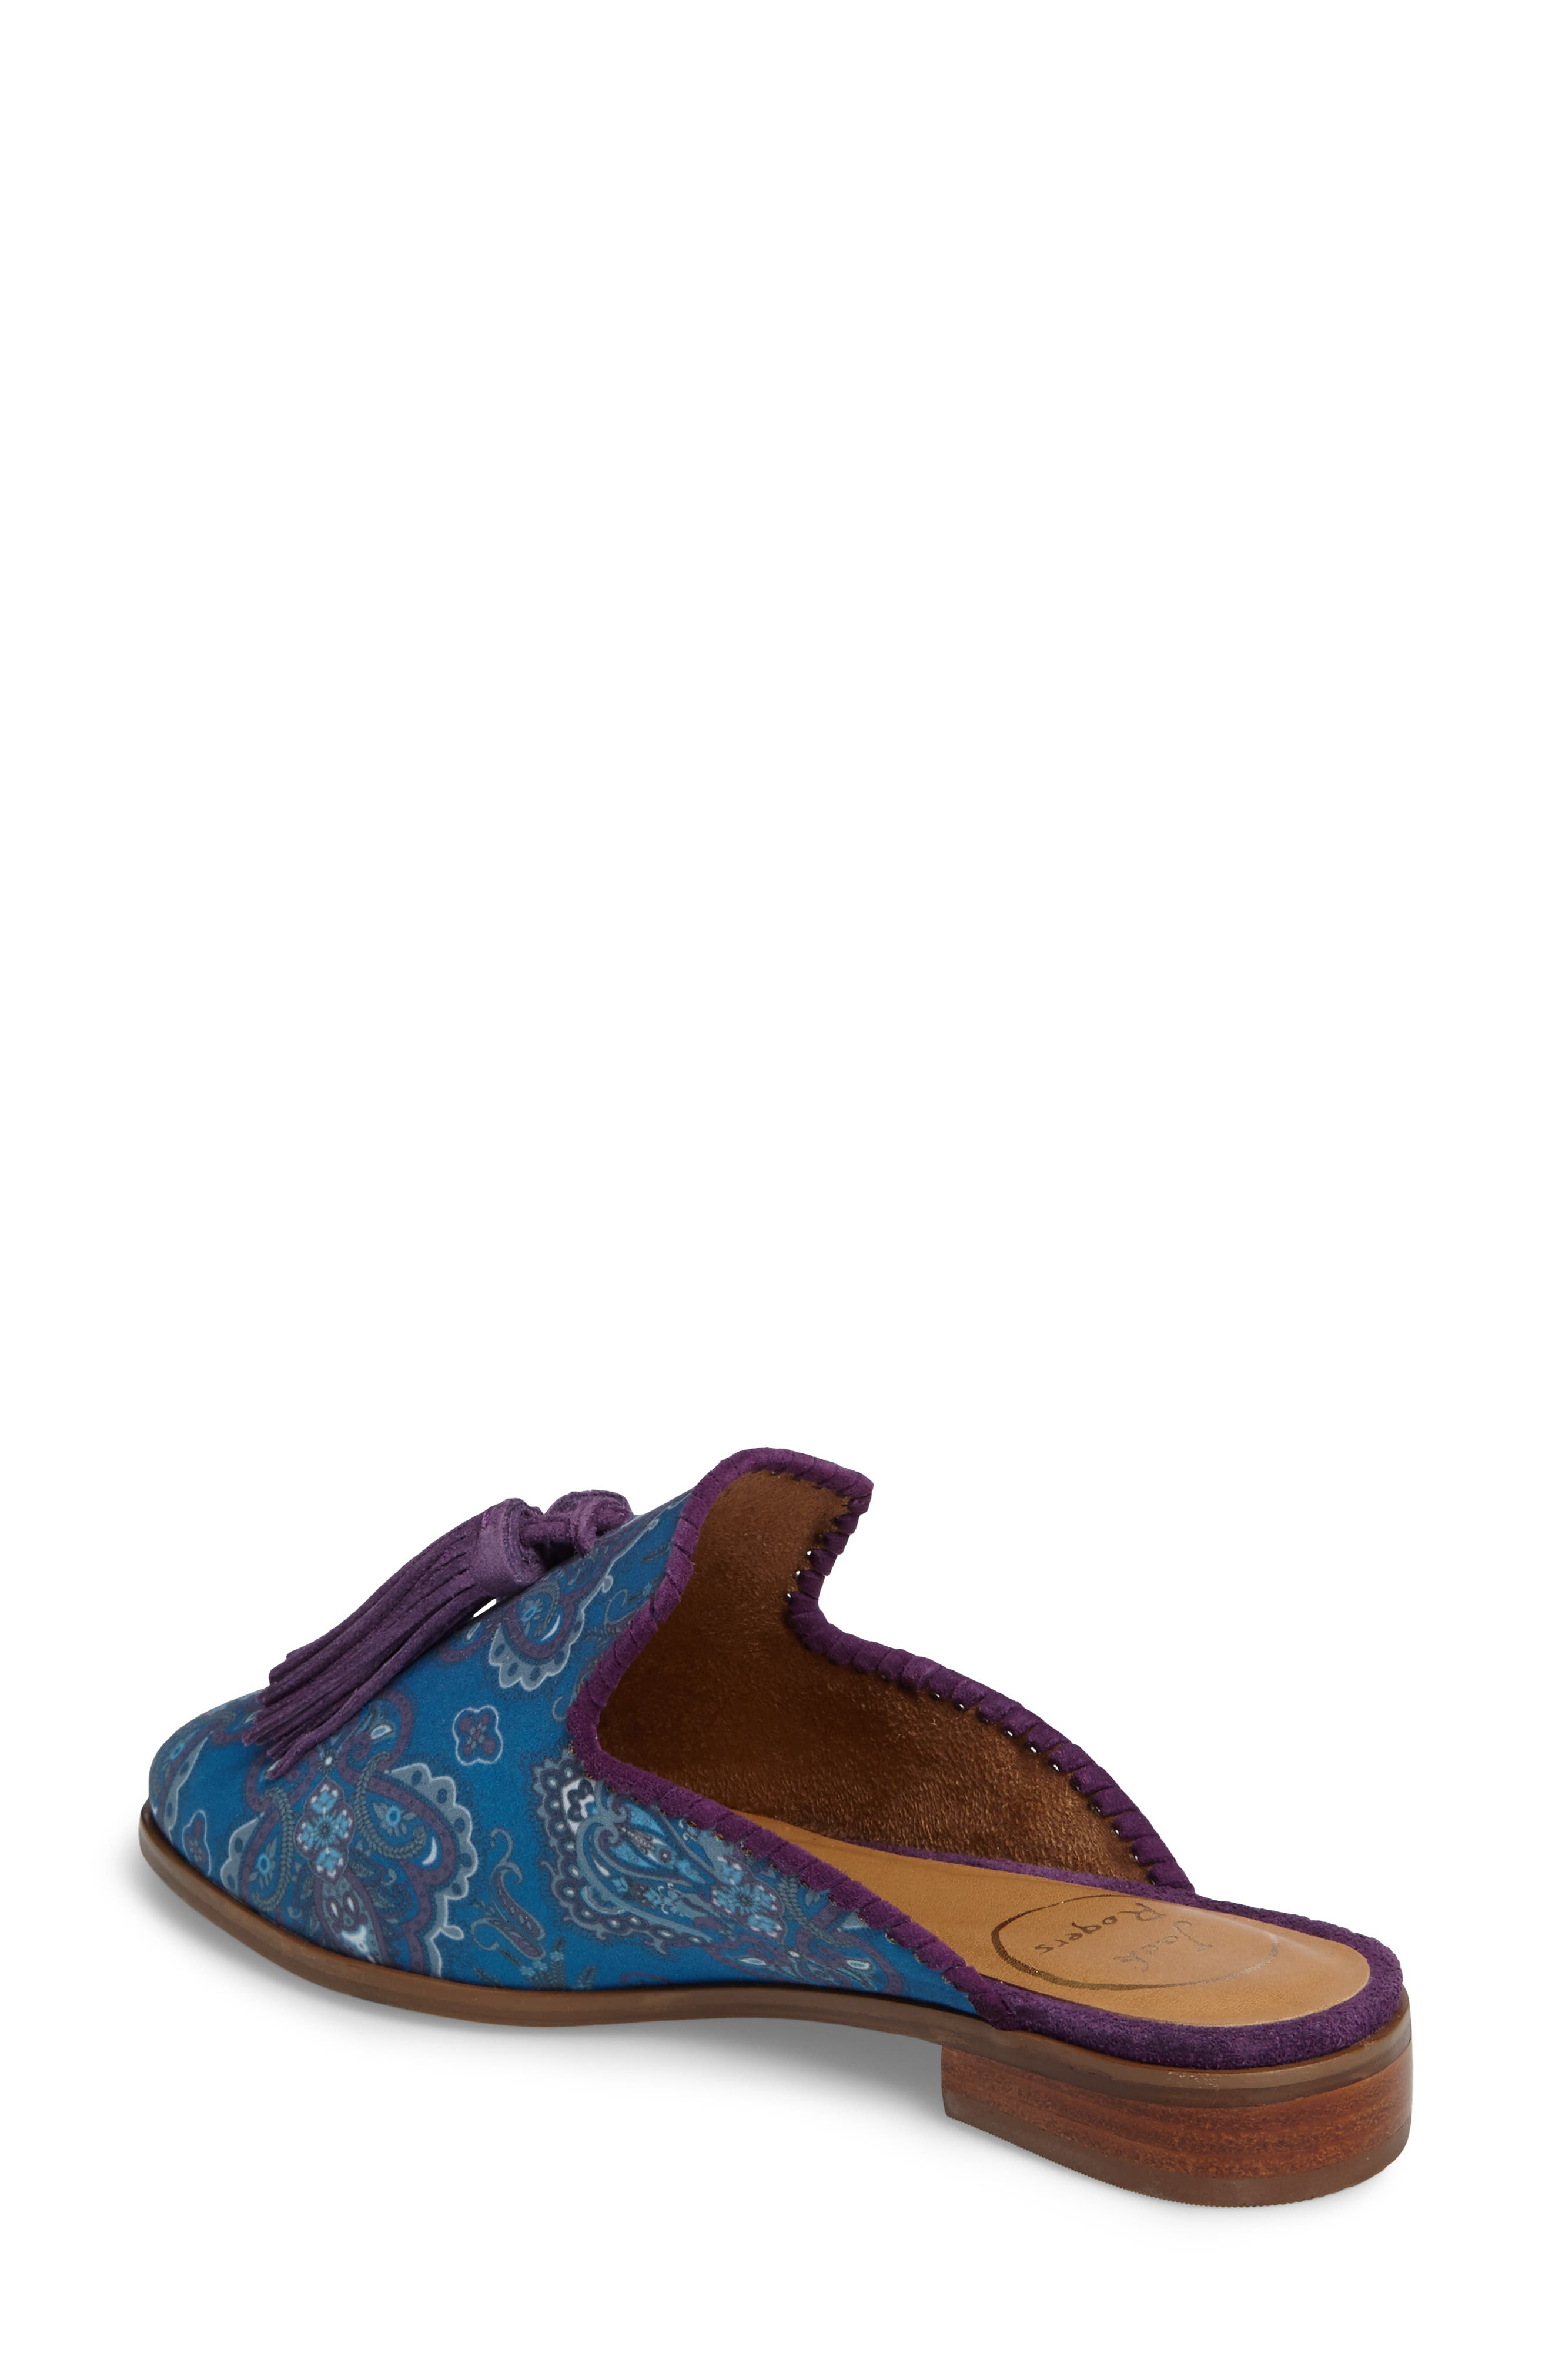 Delaney Tassel Mule,                             Alternate thumbnail 2, color,                             Blue Paisley Fabric